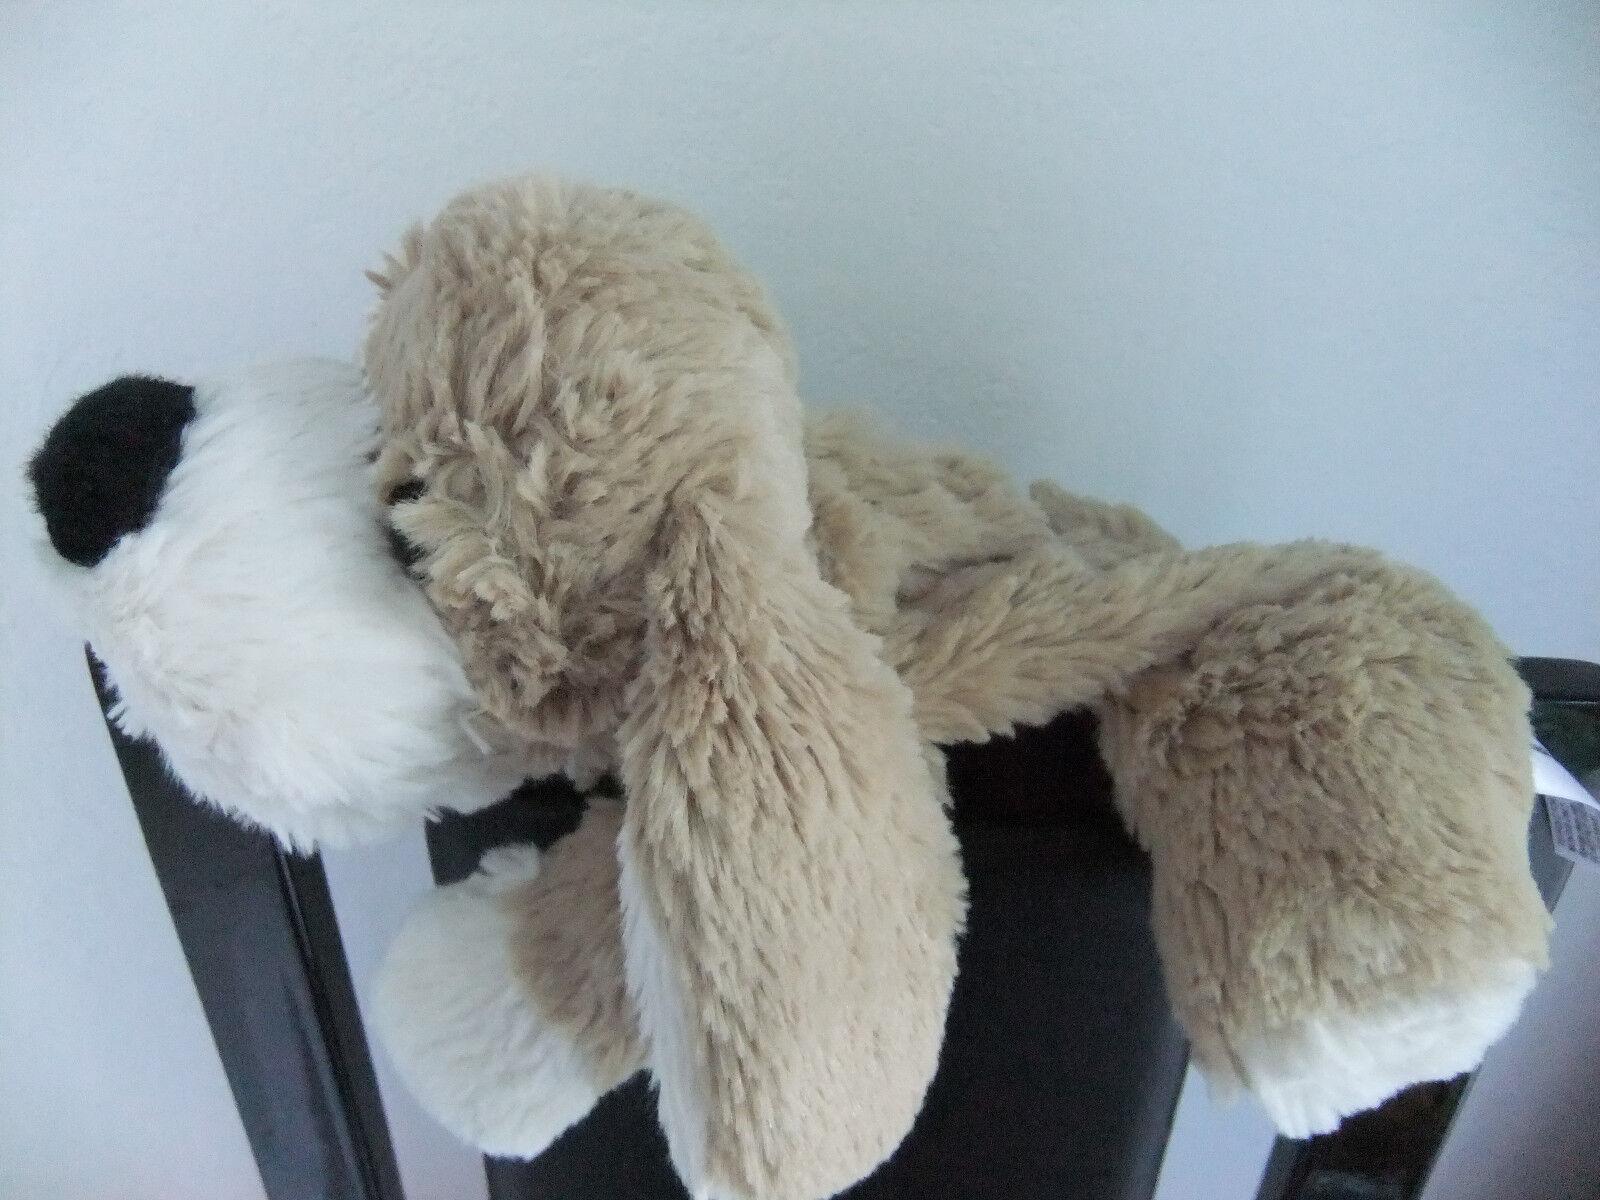 9  BHS MICROWAVE BEAR SOFT TOY HOTTIE NO WHEAT BAG TAN BEIGE CREAM PUPPY DOG